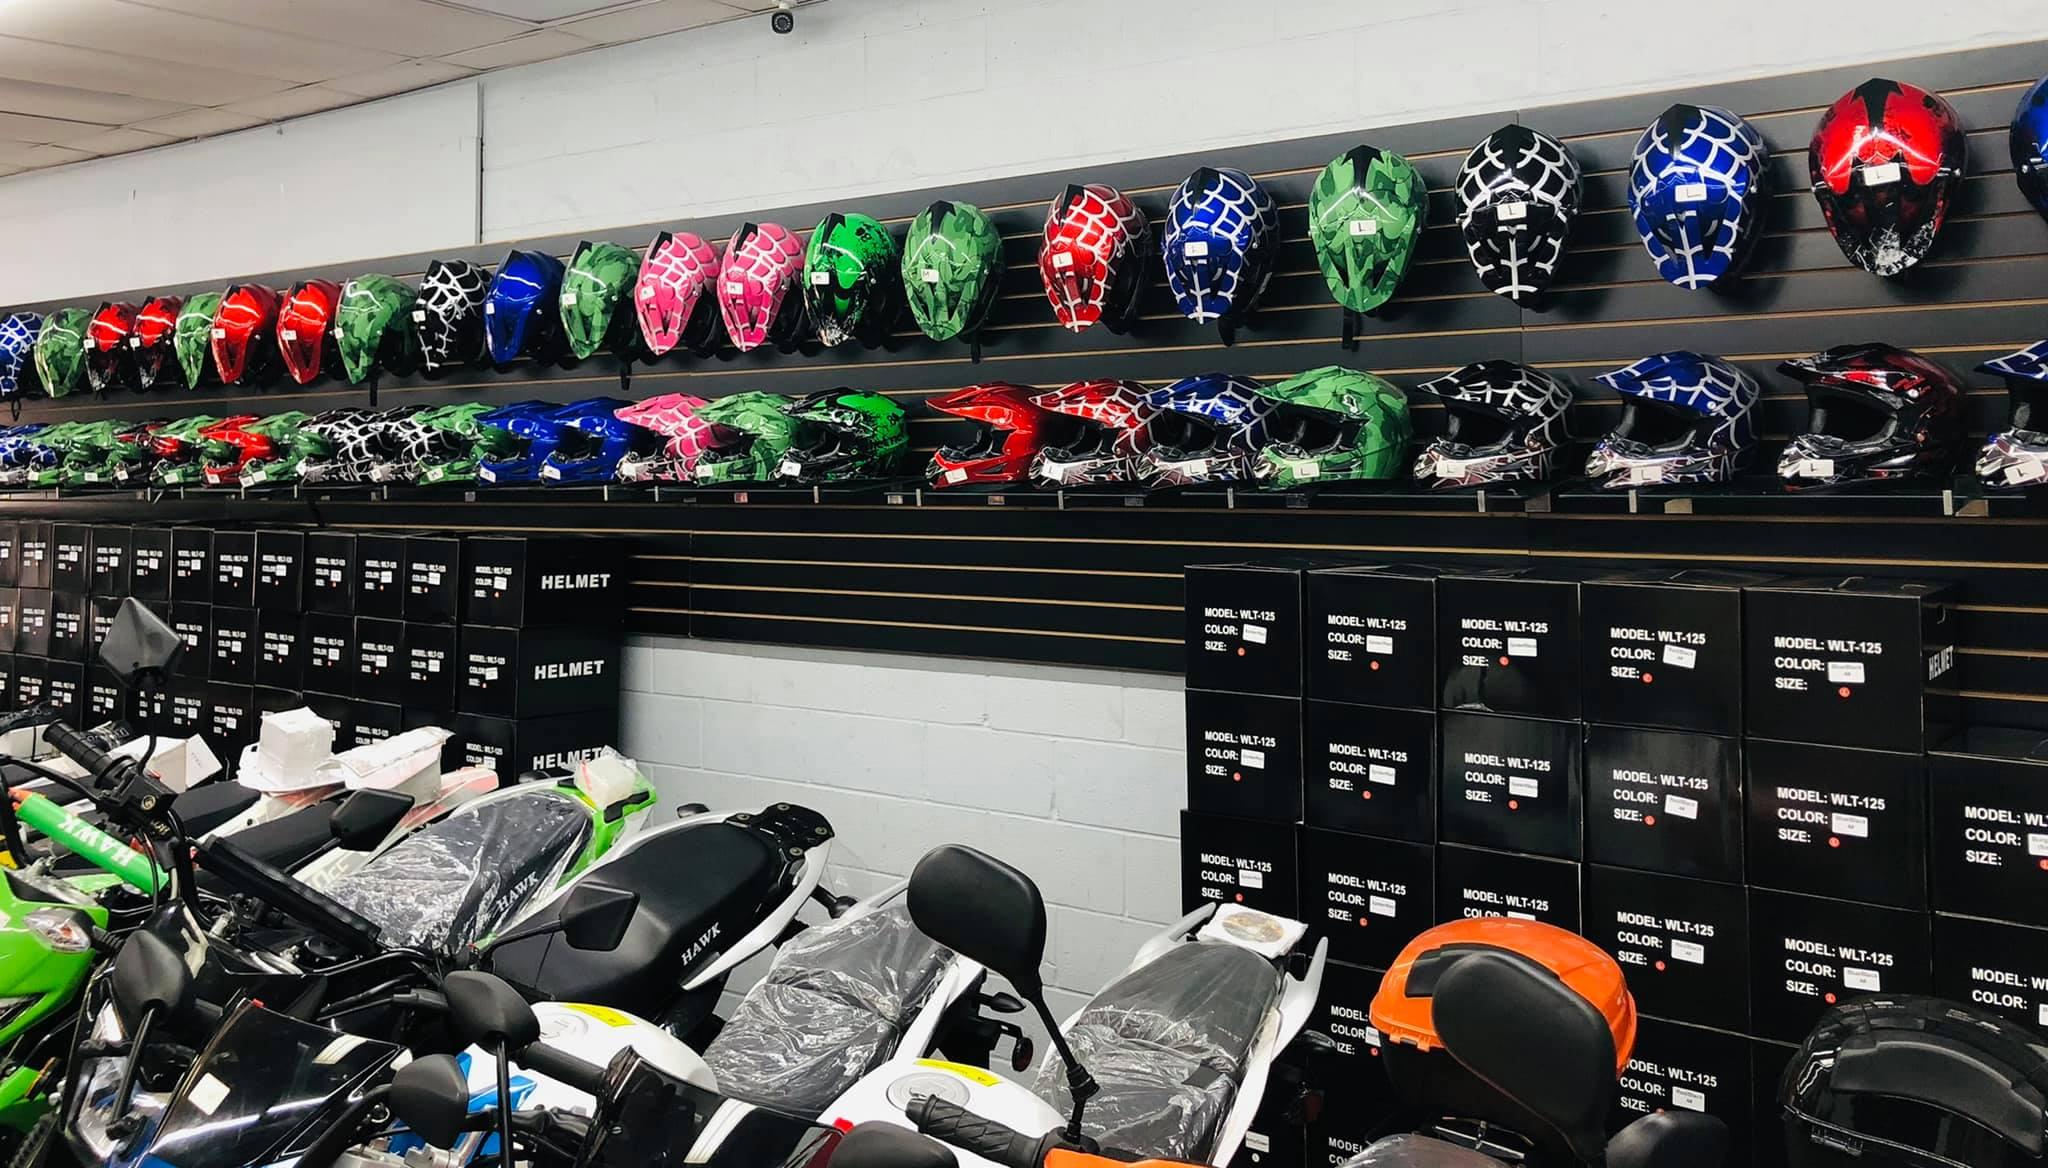 bikes https://www.usatoy.shop/